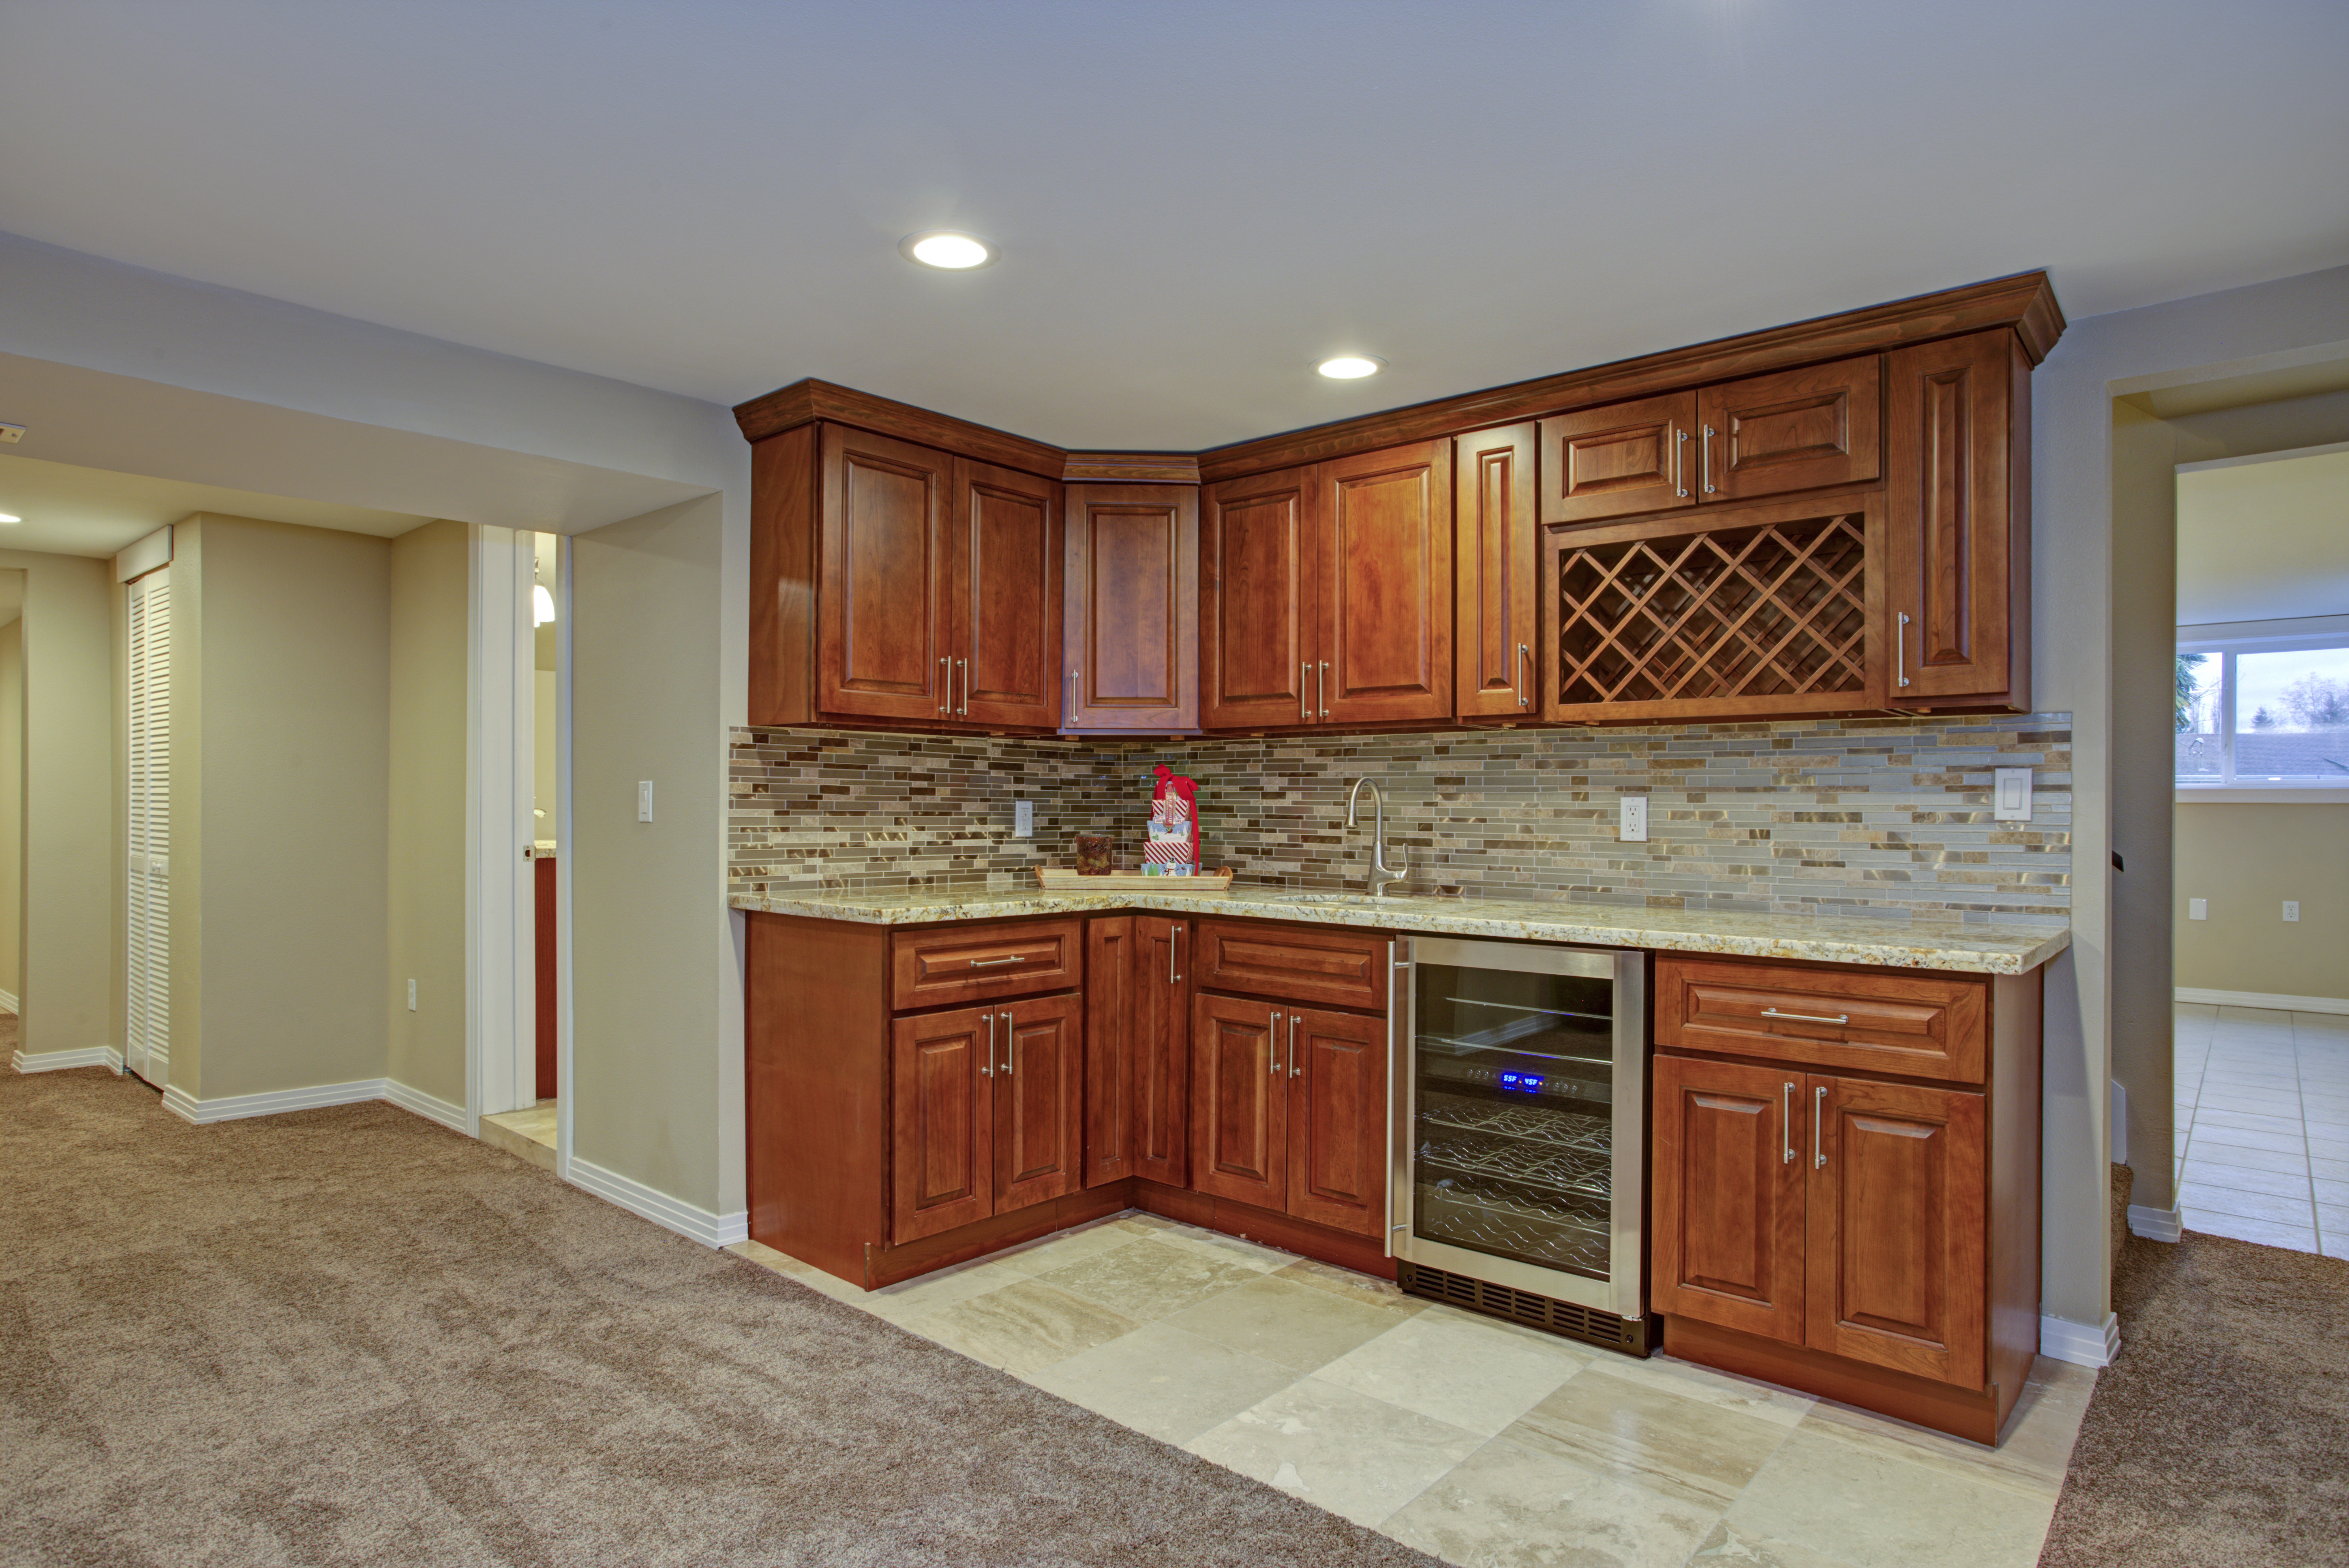 Basement remodel with kitchenette including quartz countertop with drop mount sink, cooler and mosaic backsplash.